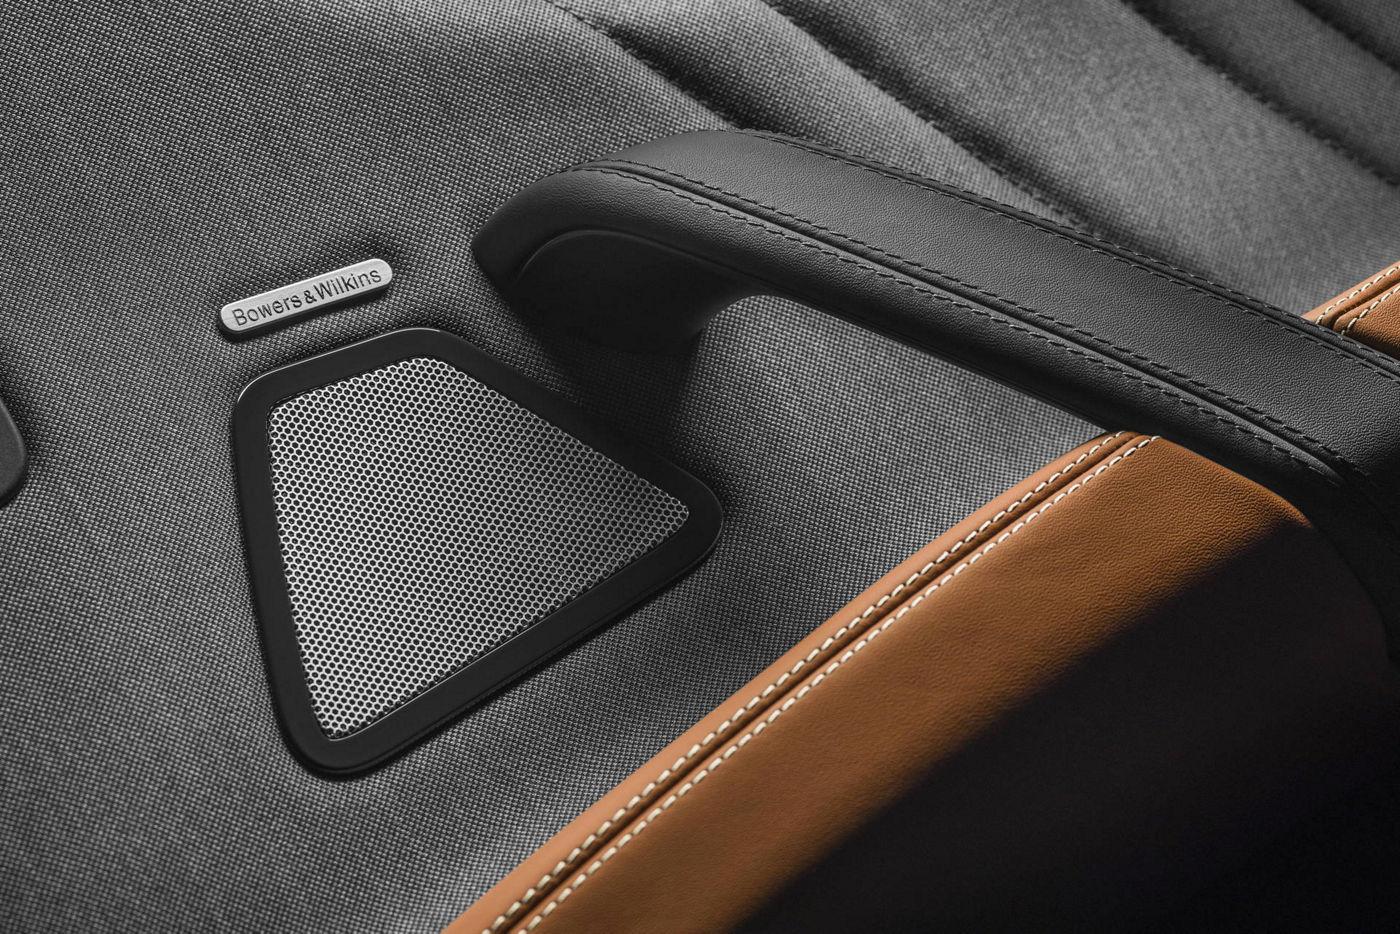 Maserati Ghibli GranLusso: Bowers & Wilkins Surround Sound system detail